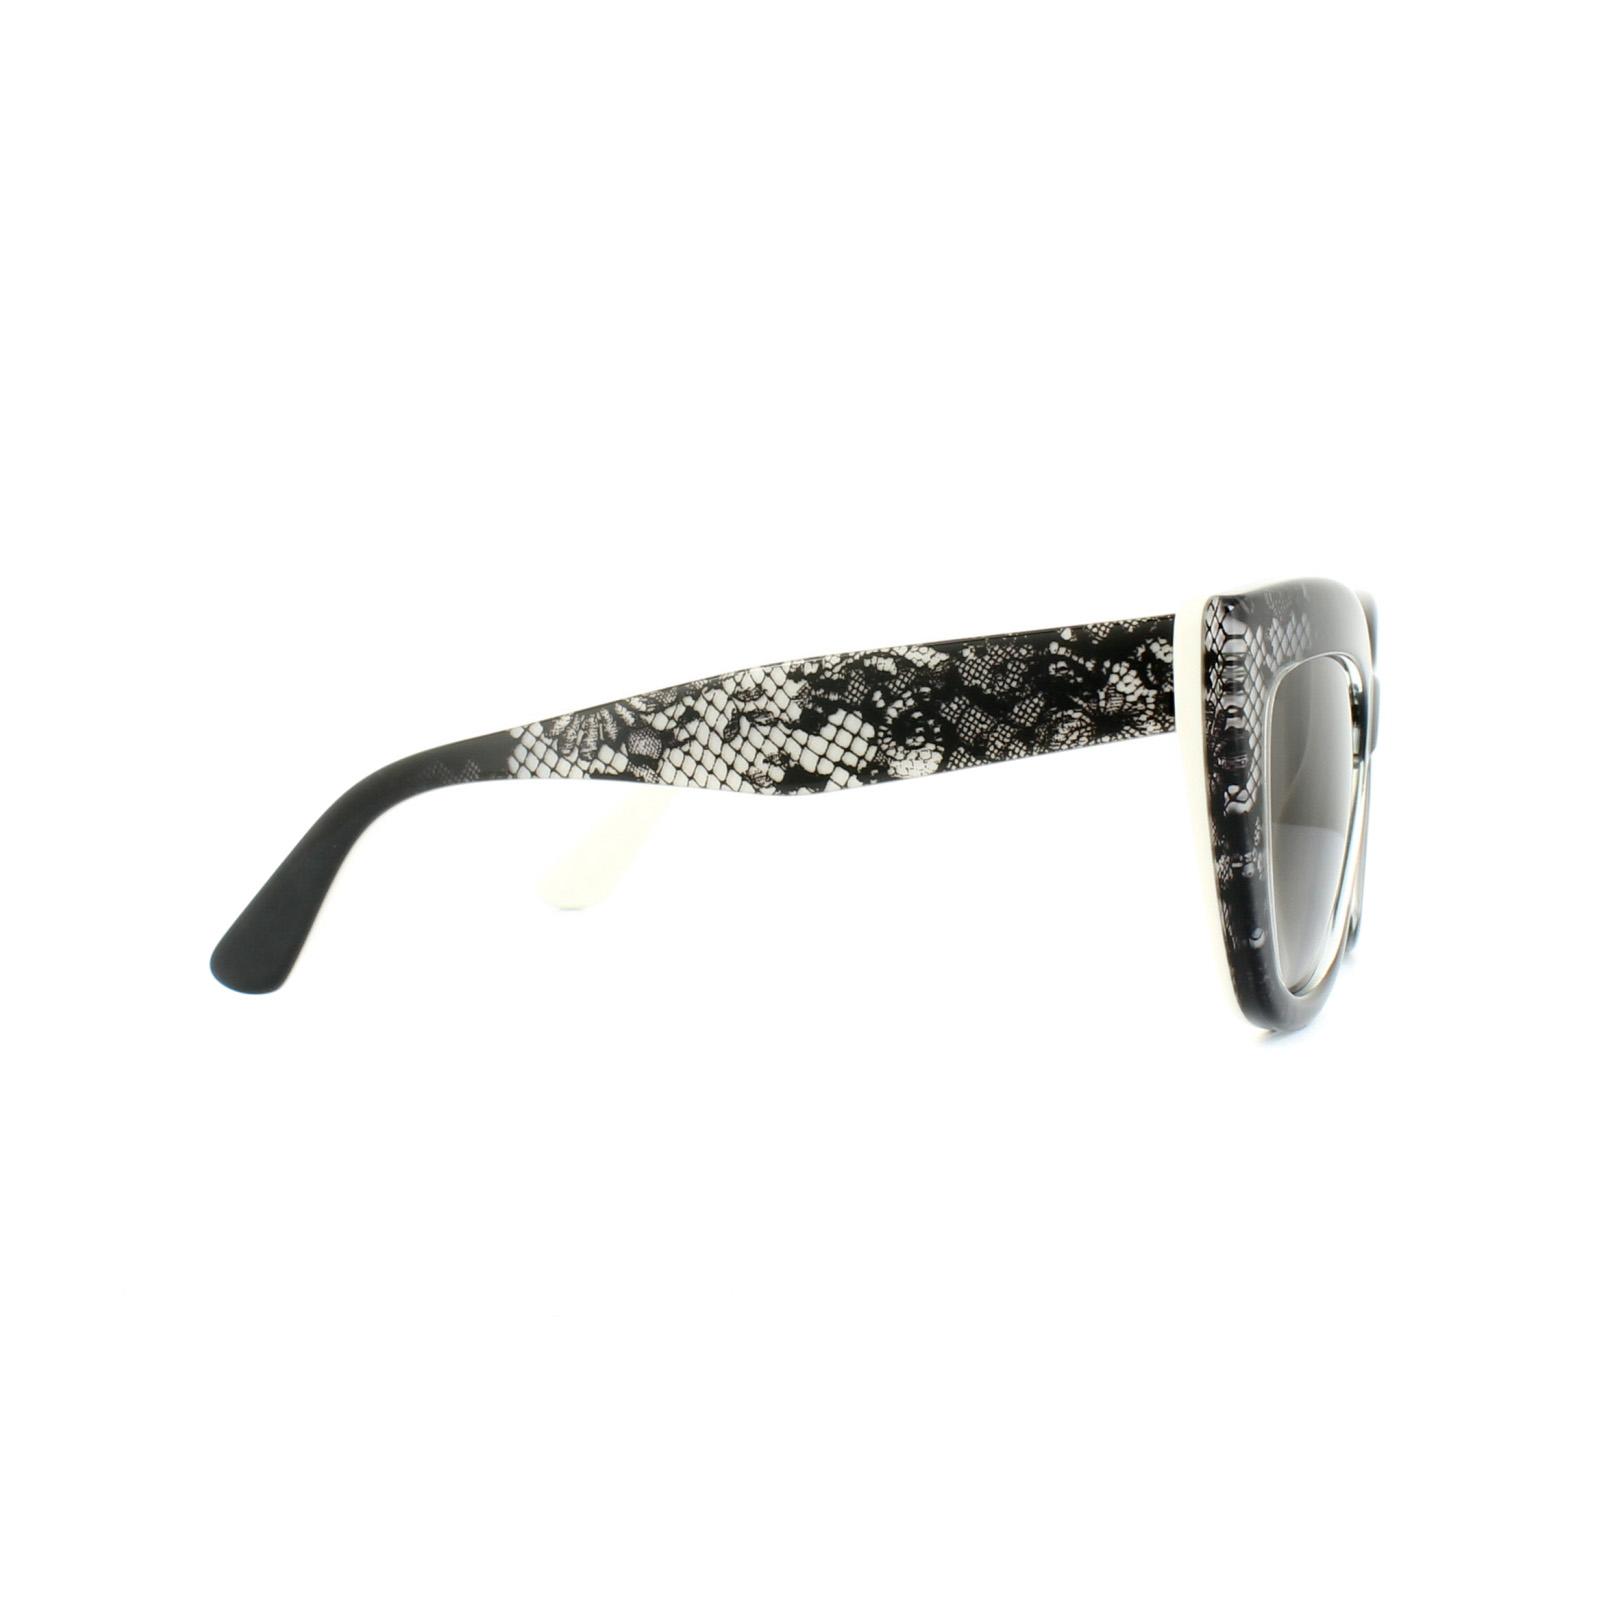 8d0050427820a Cheap Valentino V710S Sunglasses - Discounted Sunglasses